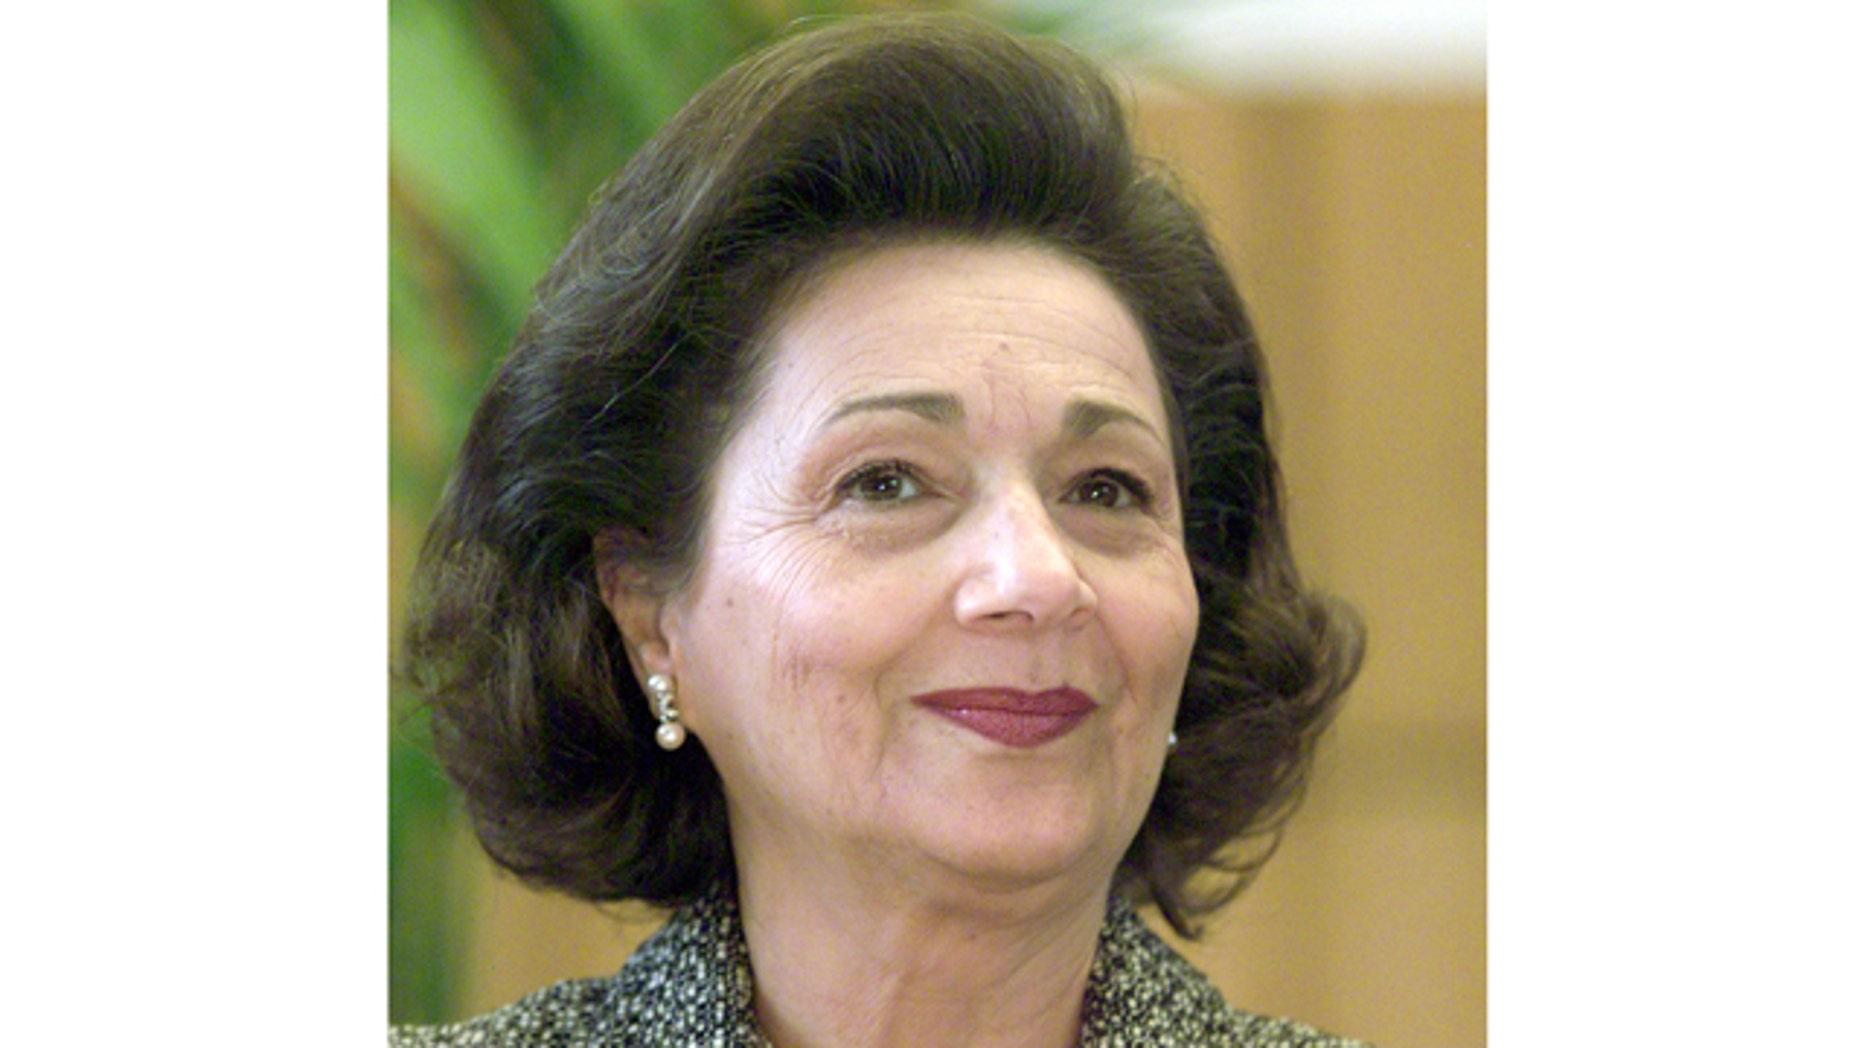 In this Feb. 19, 2003 file photo, Suzanne Mubarak, wife of former Egypt President Hosni Mubarak, smiles at the Free University Berlin.